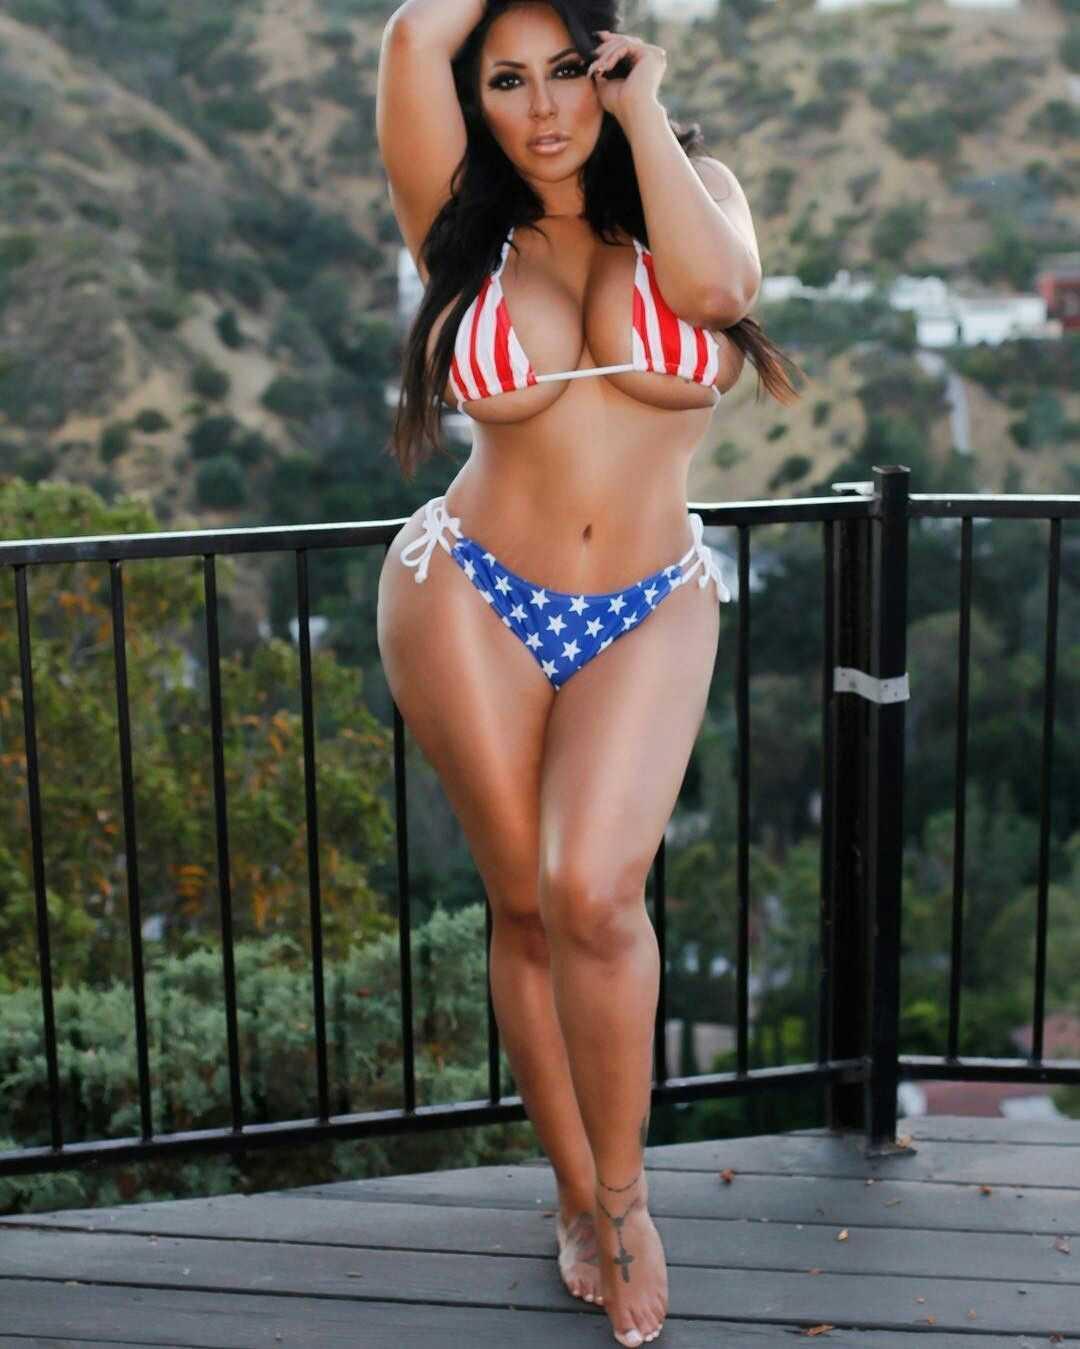 Jimmy Garoppolo girlfriend Kiara Mia in Bikini